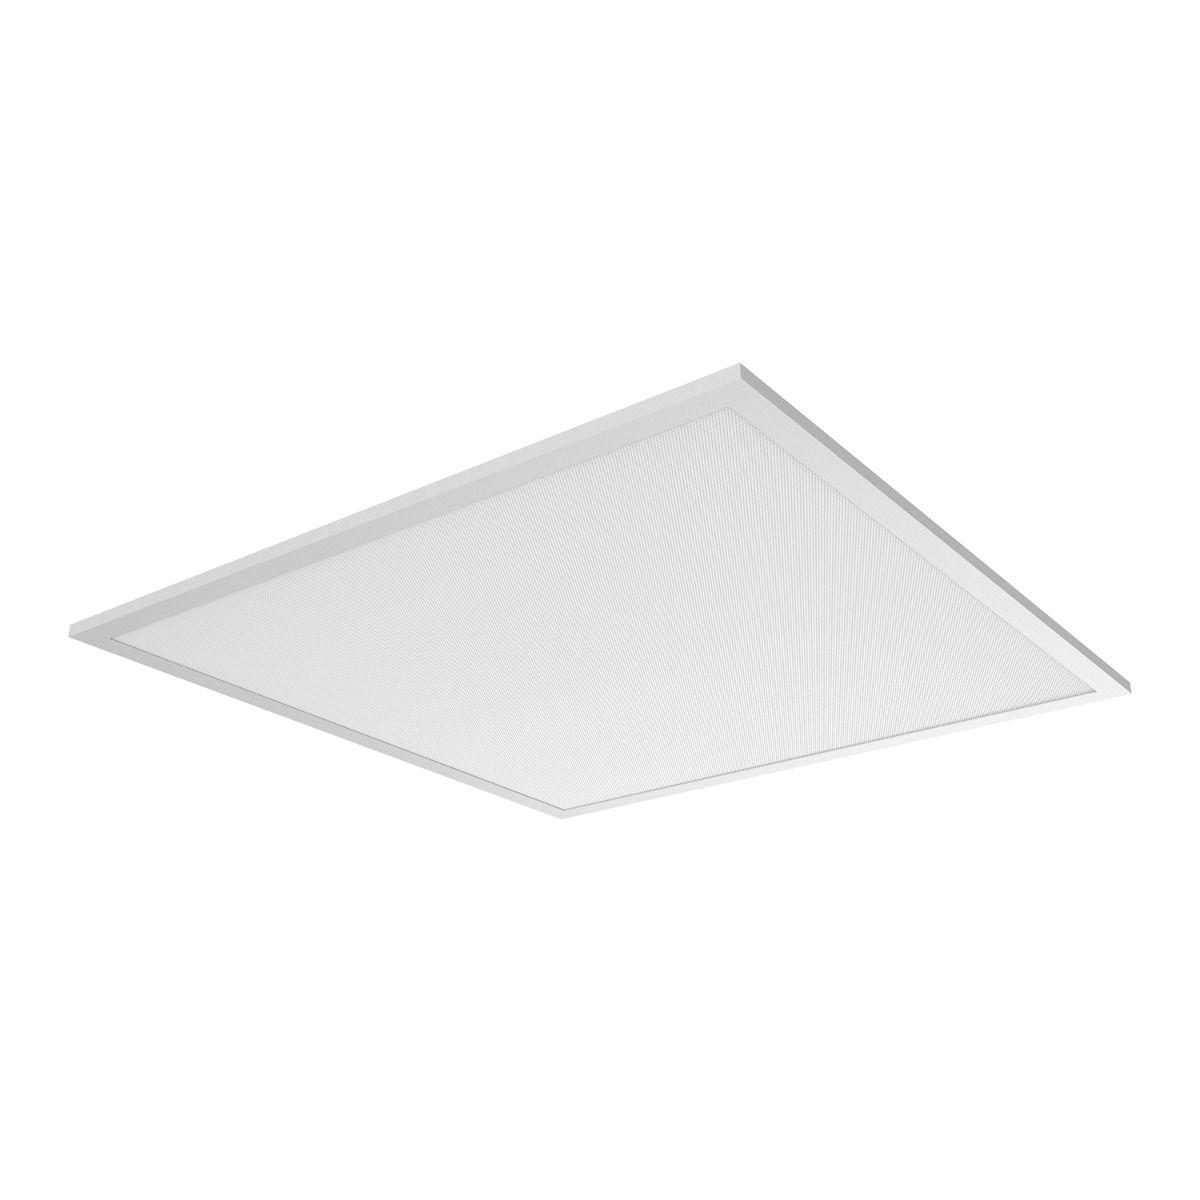 Noxion LED Panel Delta Pro V3 Highlum 36W 4000K 5500lm 60x60cm UGR <19 | Cool White - Replaces 4x18W